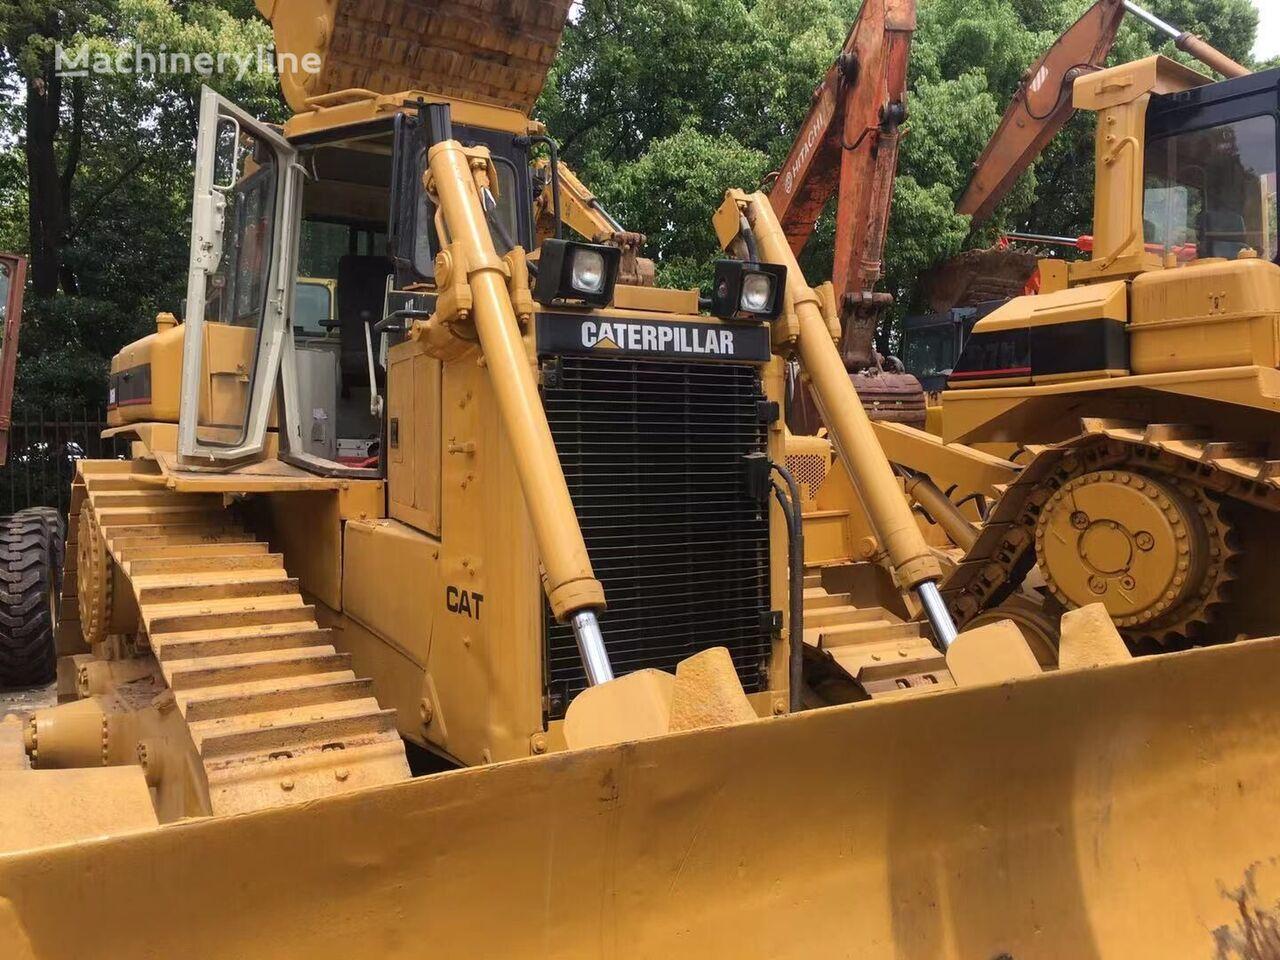 CATERPILLAR D6H-II bulldozer